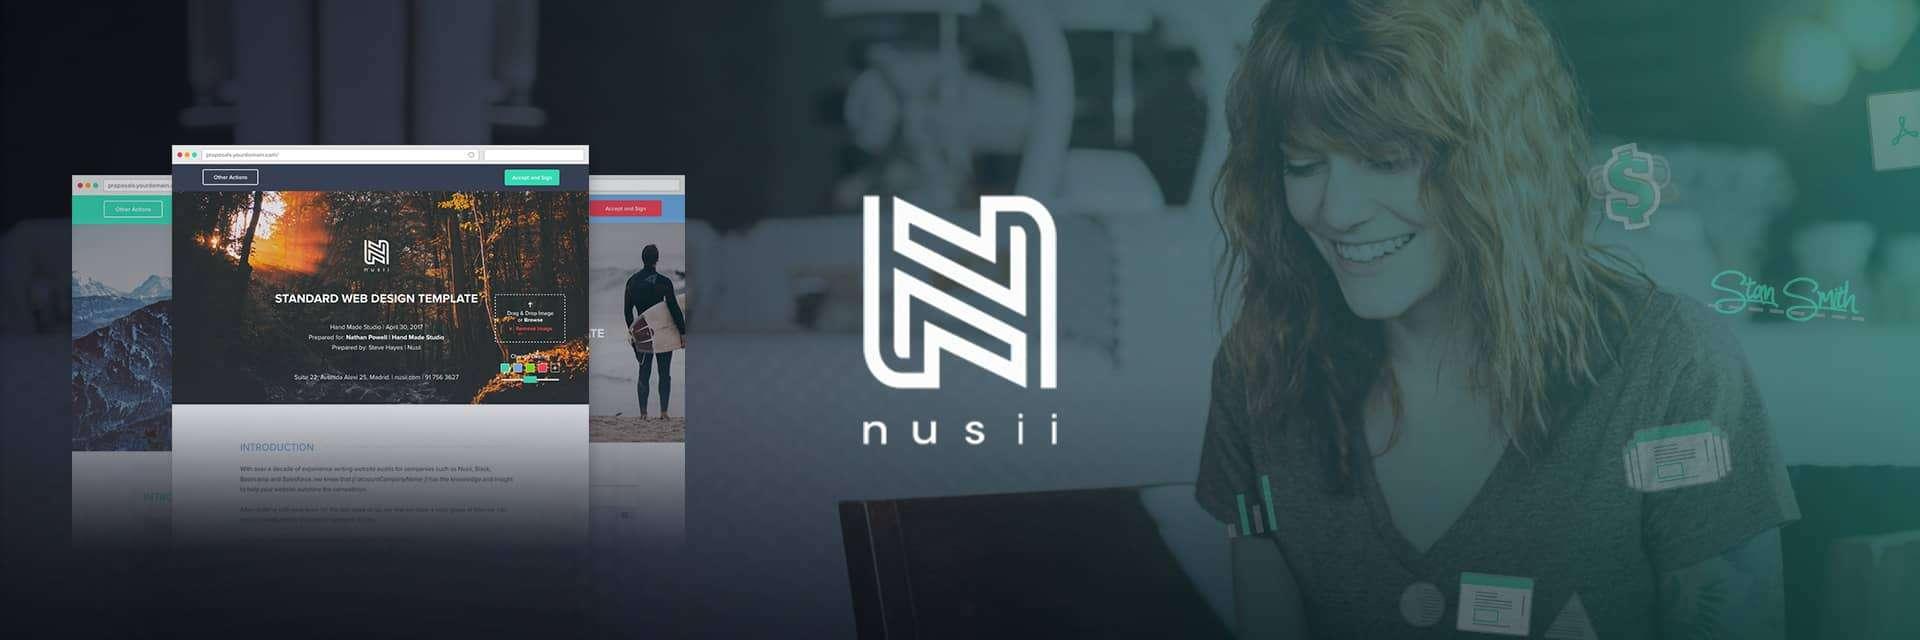 Nusli-banner